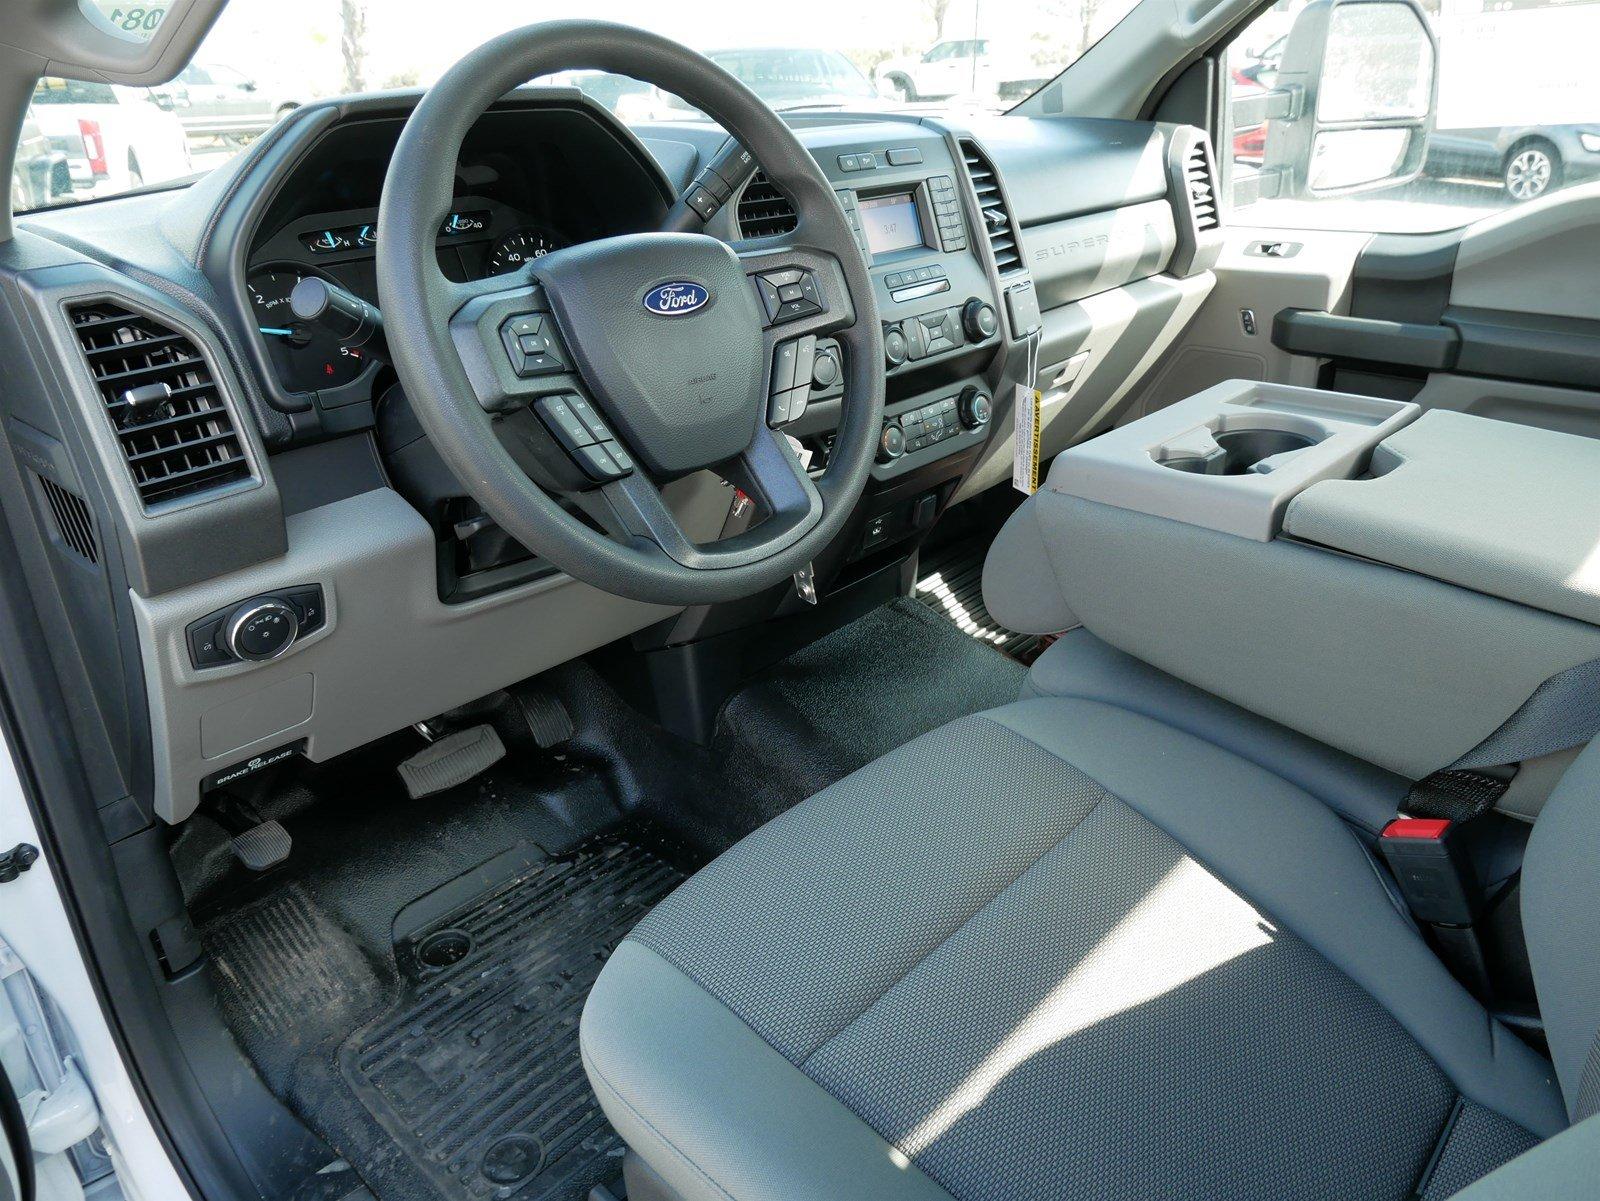 2020 F-550 Regular Cab DRW 4x4, Scelzi SEC Combo Body #63081 - photo 14